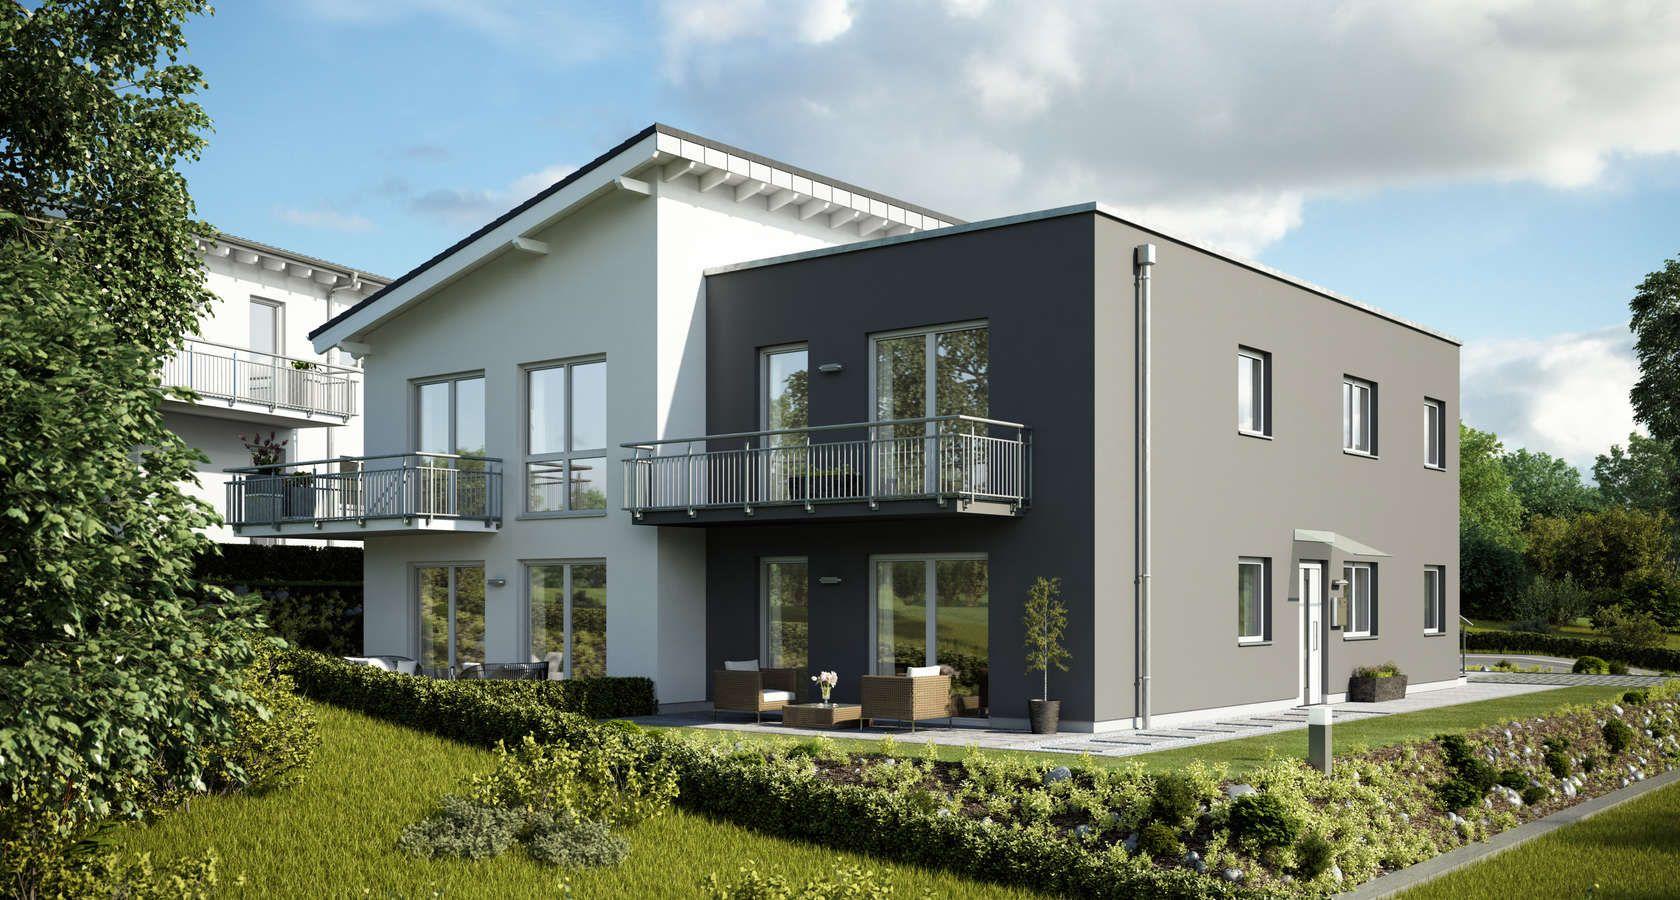 Mehrfamilienhäuser in 2020 Mehrfamilienhaus bauen, Haus